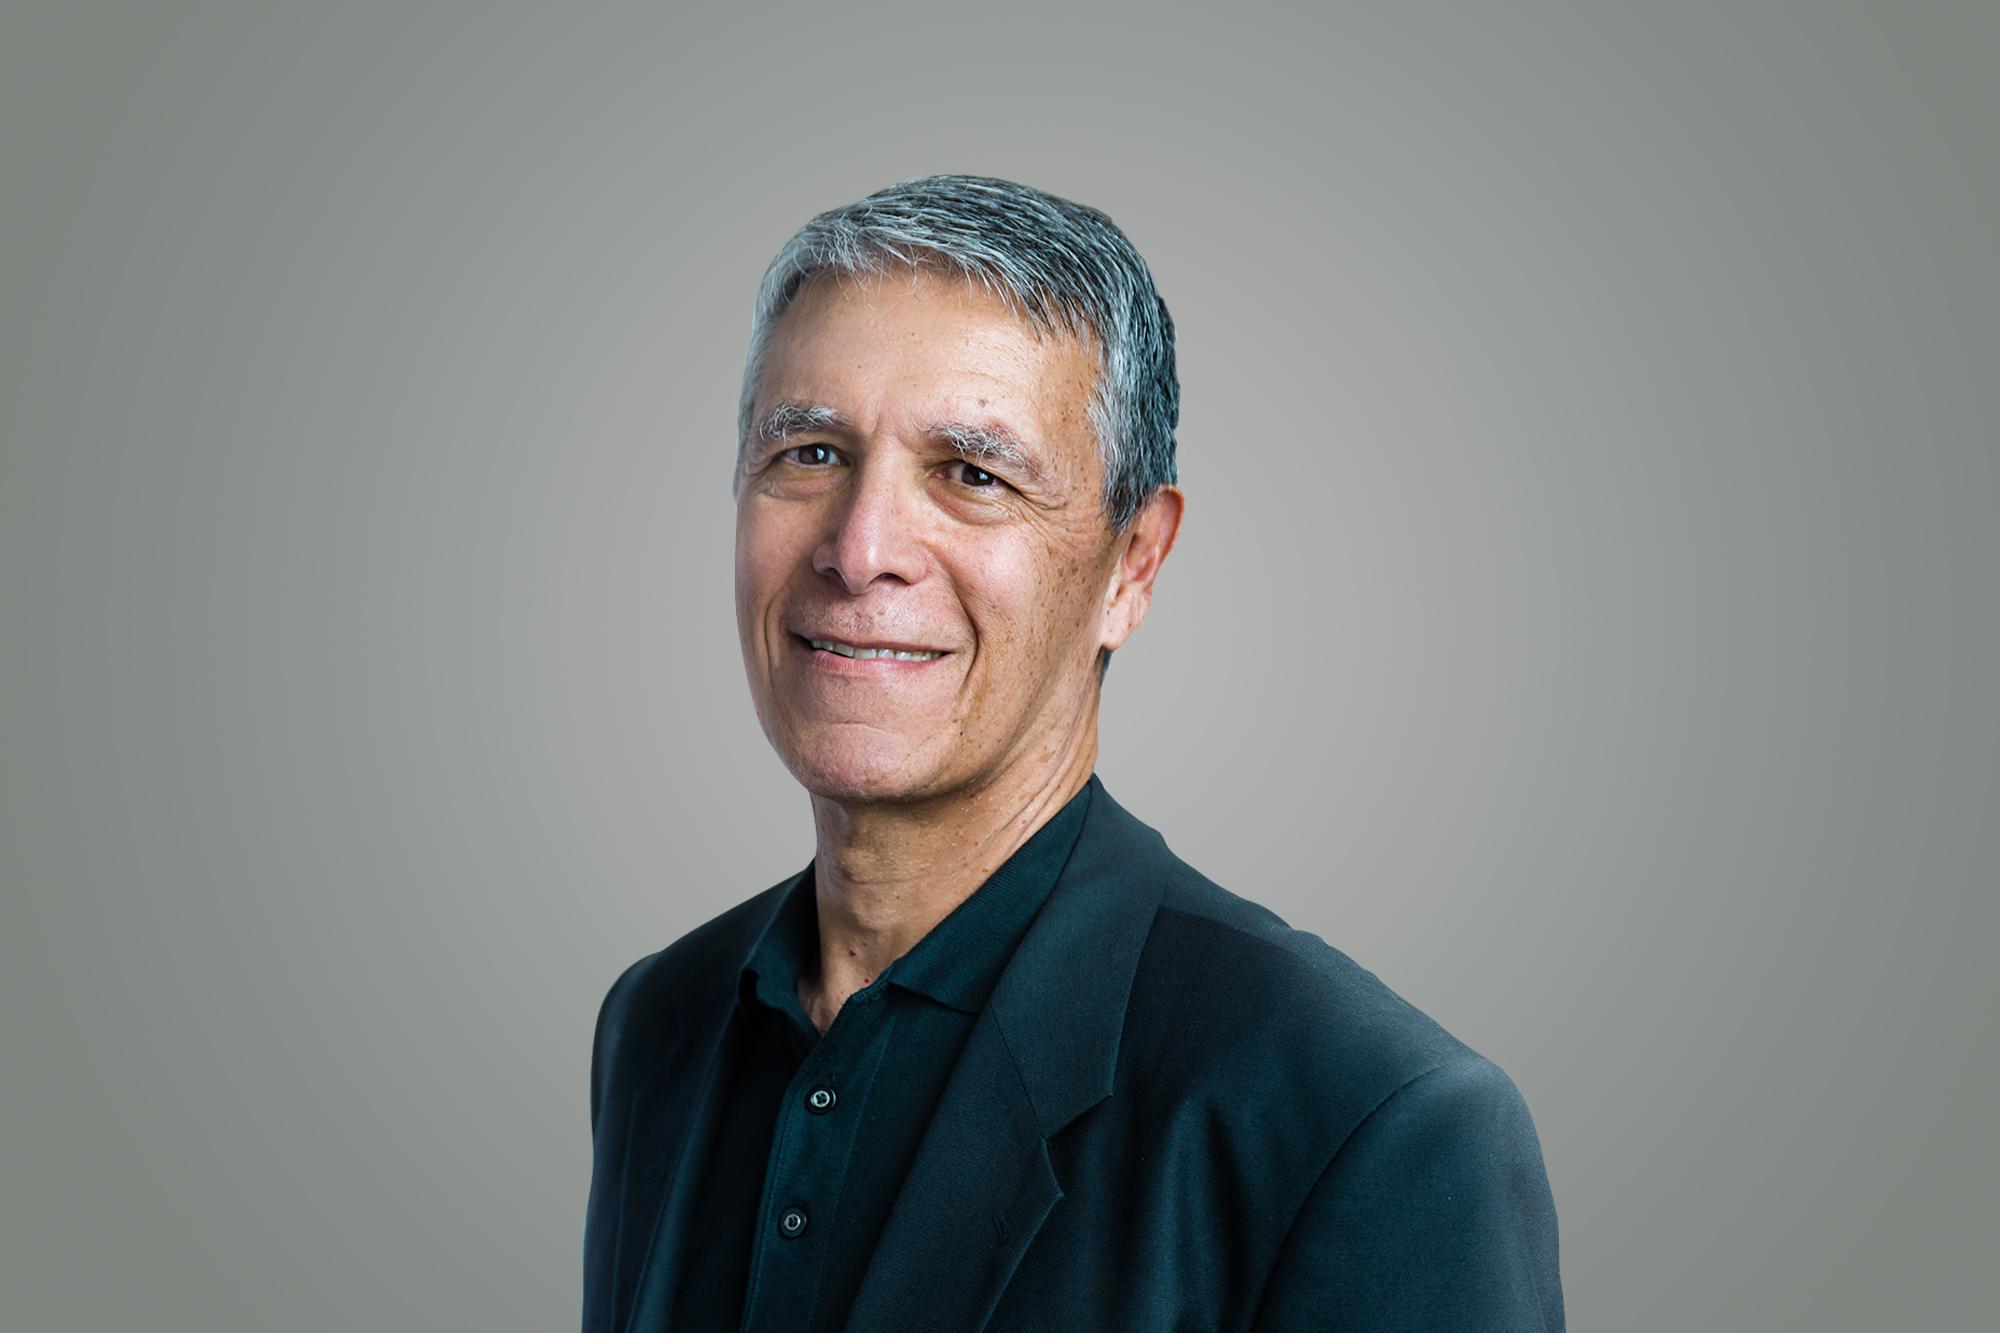 Lee Rodriguez